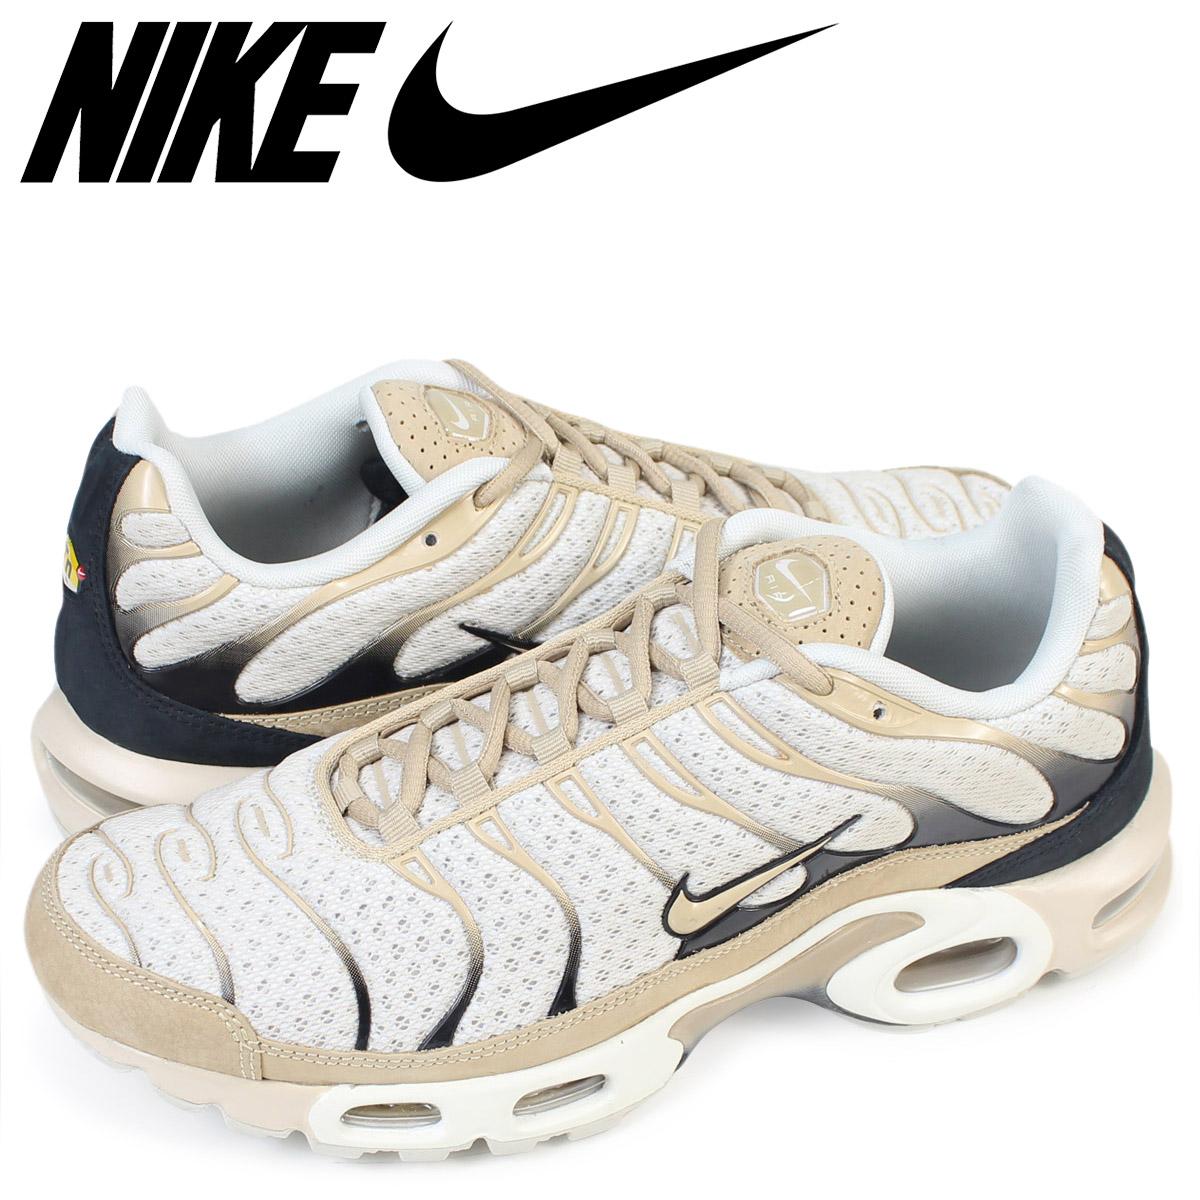 sports shoes 819be ccc46 NIKE LAB Nike laboratory Air Max sneakers AIR MAX PLUS 898,018-002 men's  shoes beige [9/6 Shinnyu load] [179]